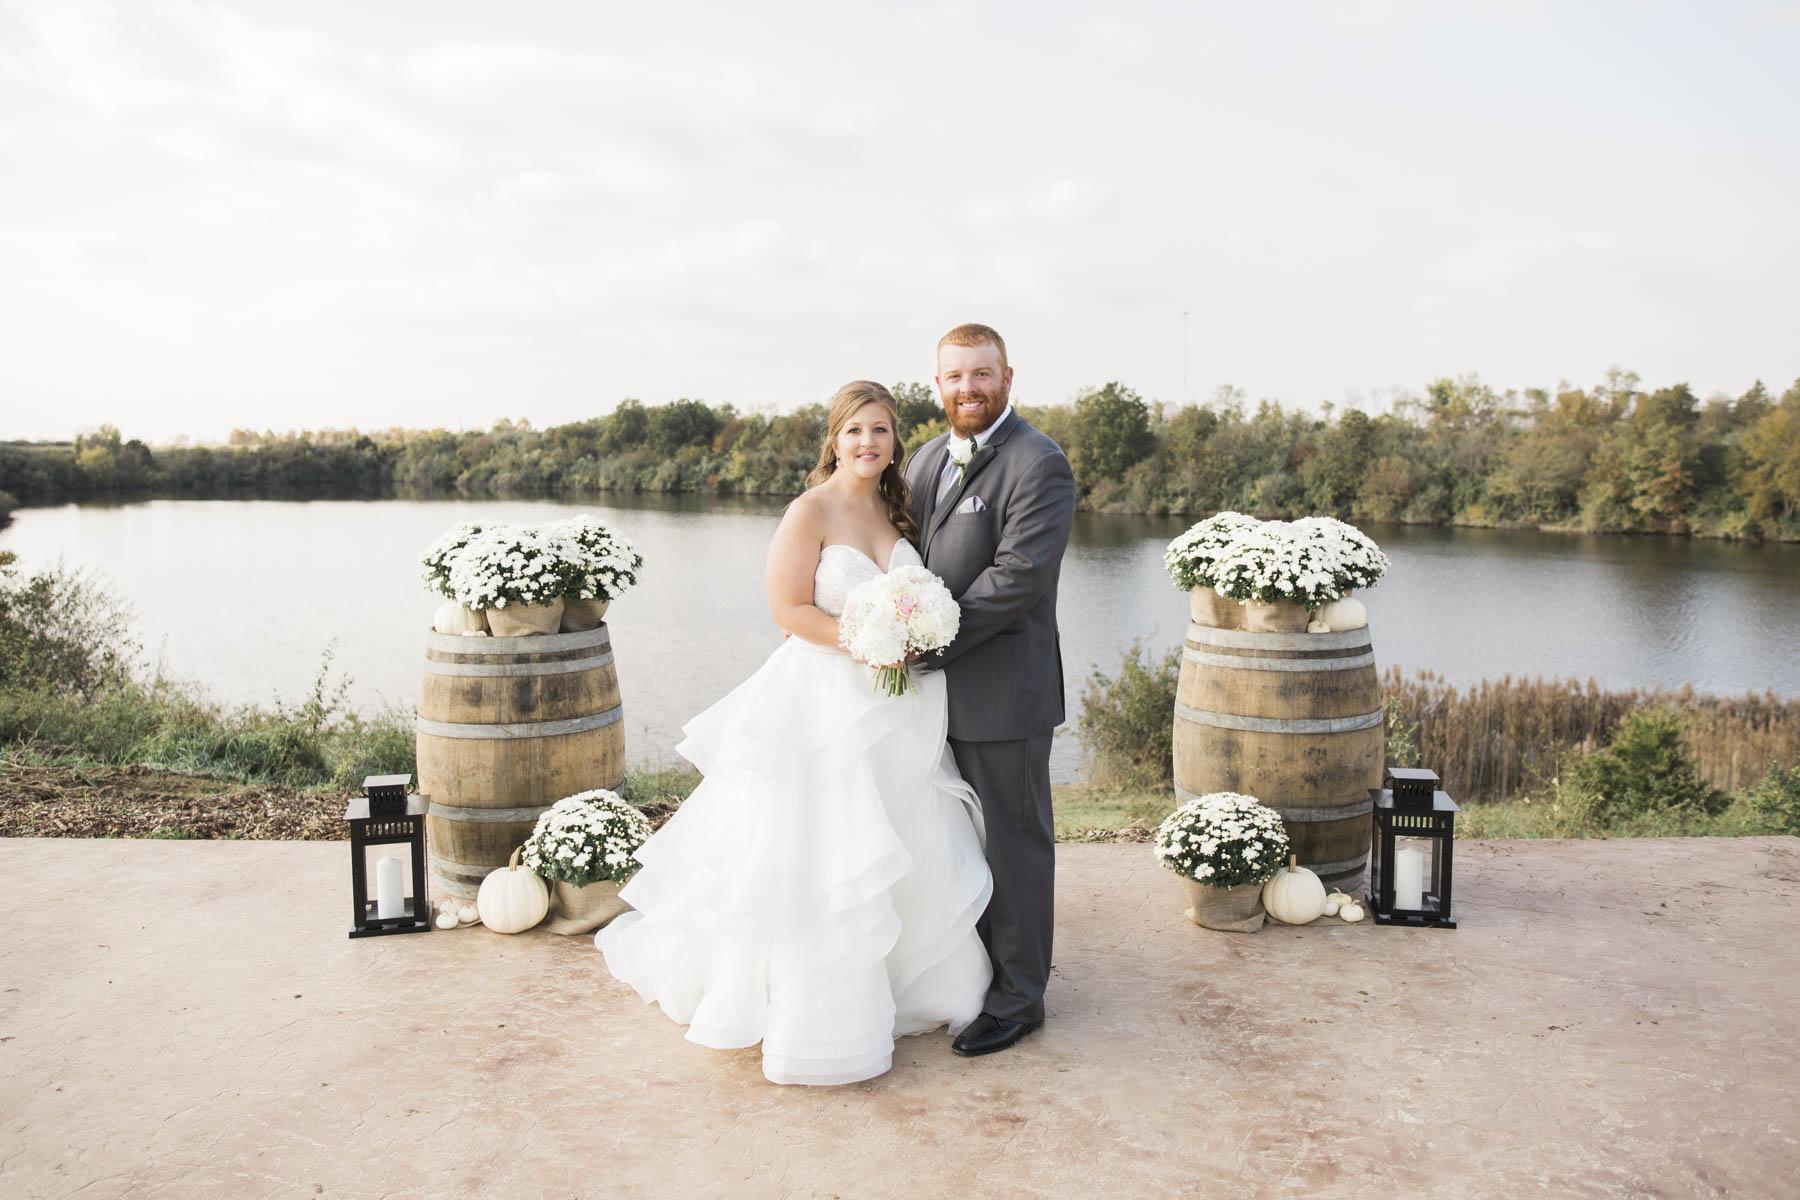 shotbychelsea_blog_wedding-26.jpg